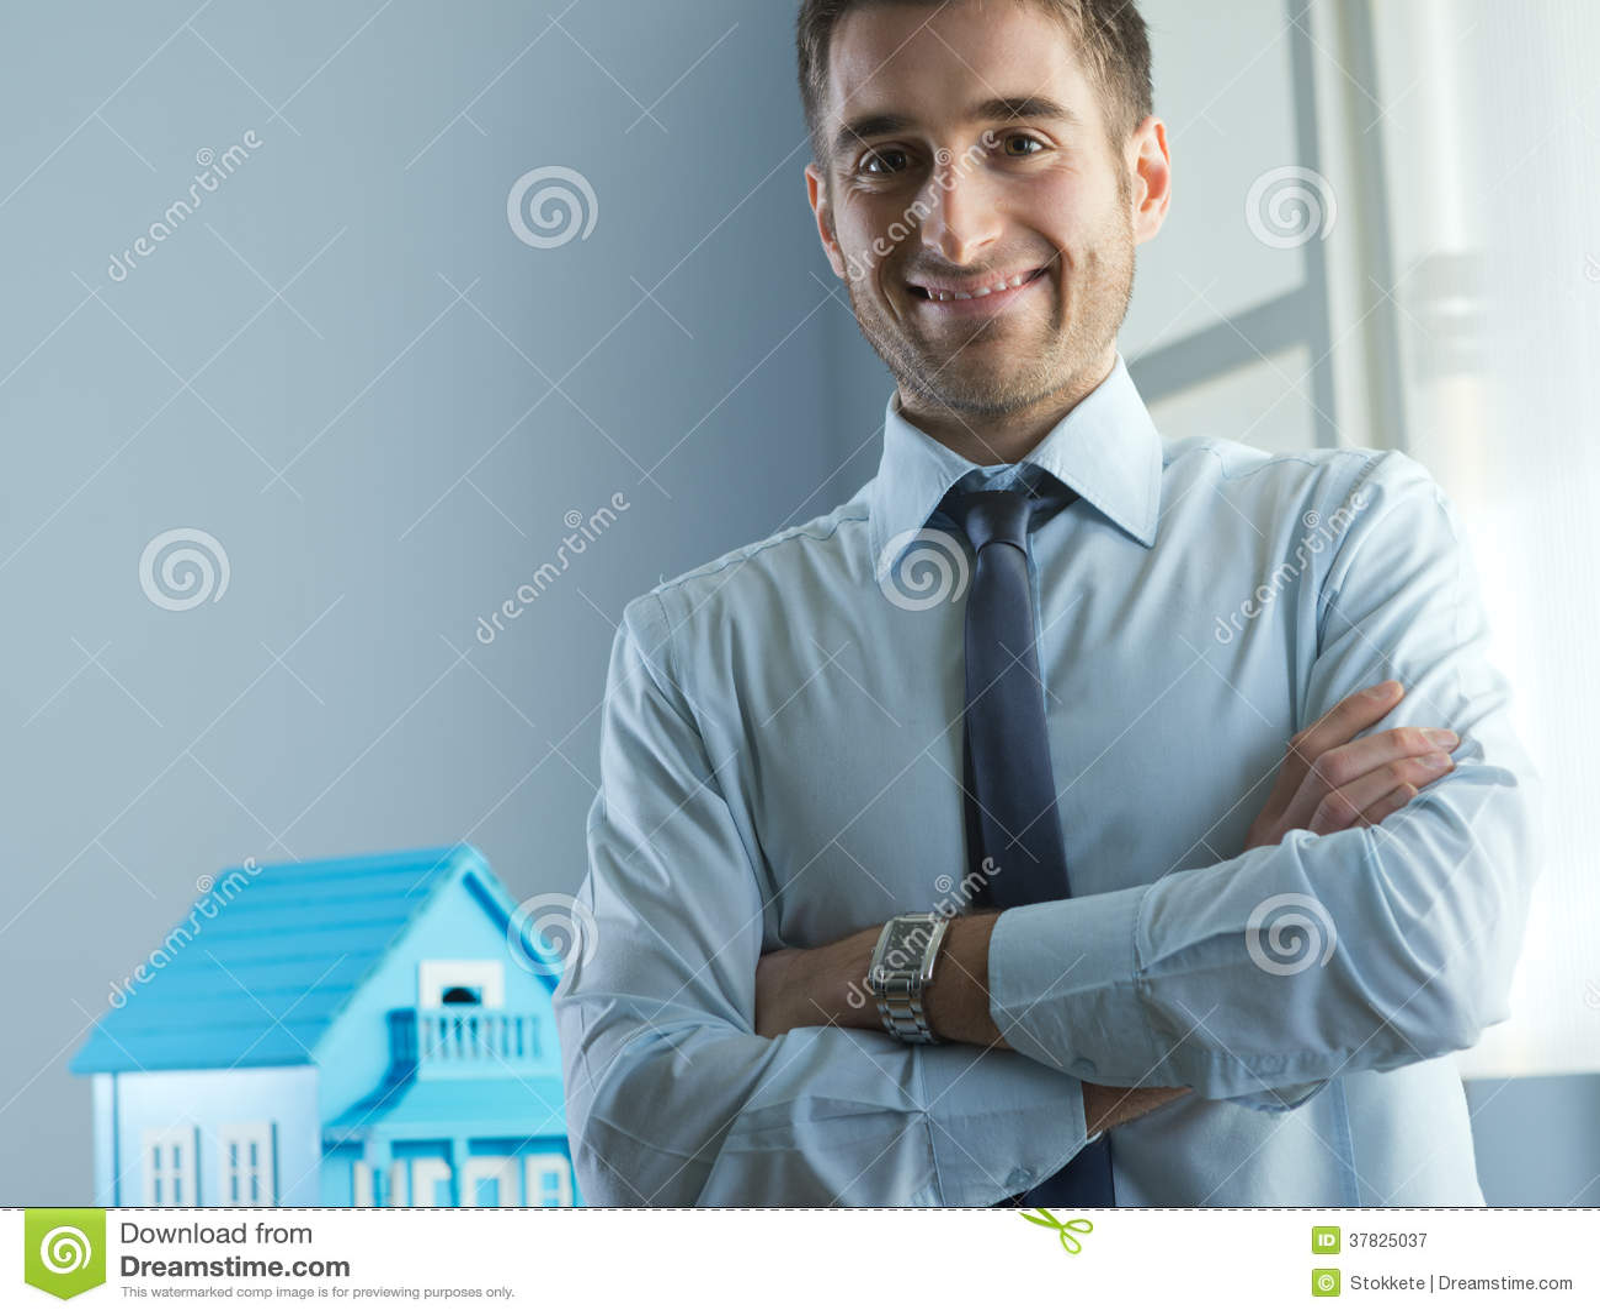 Vraie agence immobilière